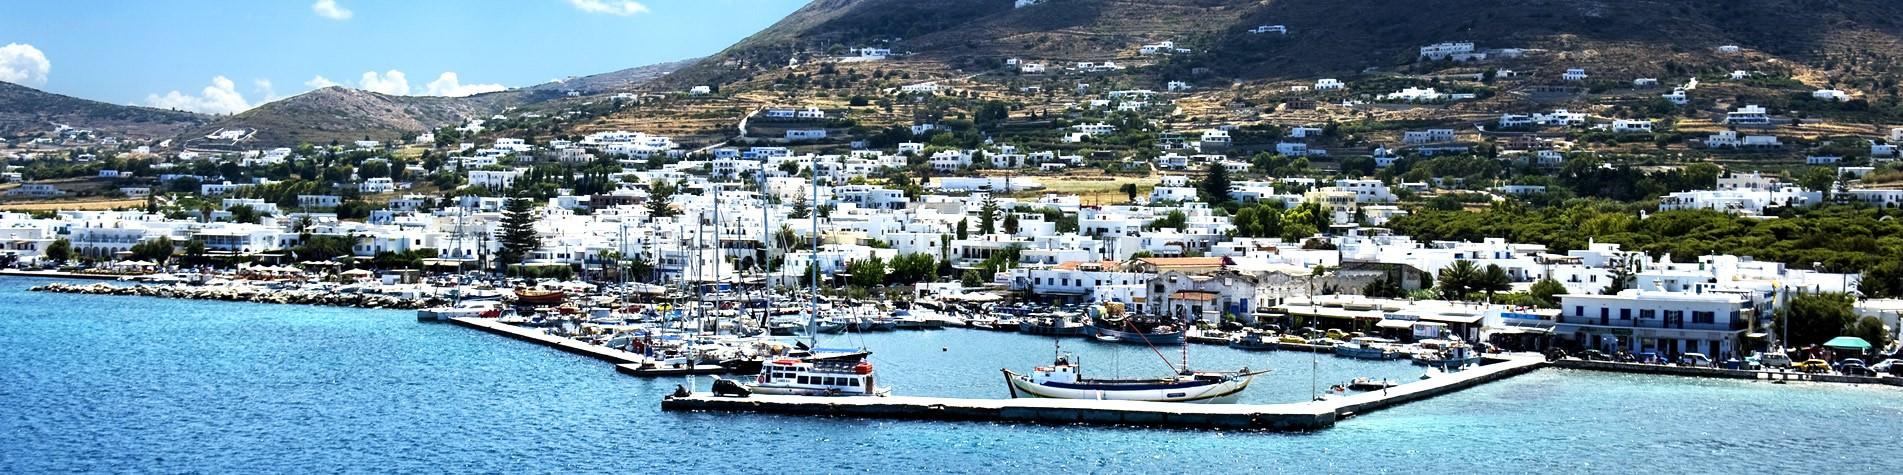 Paros Island Holidays Specialists